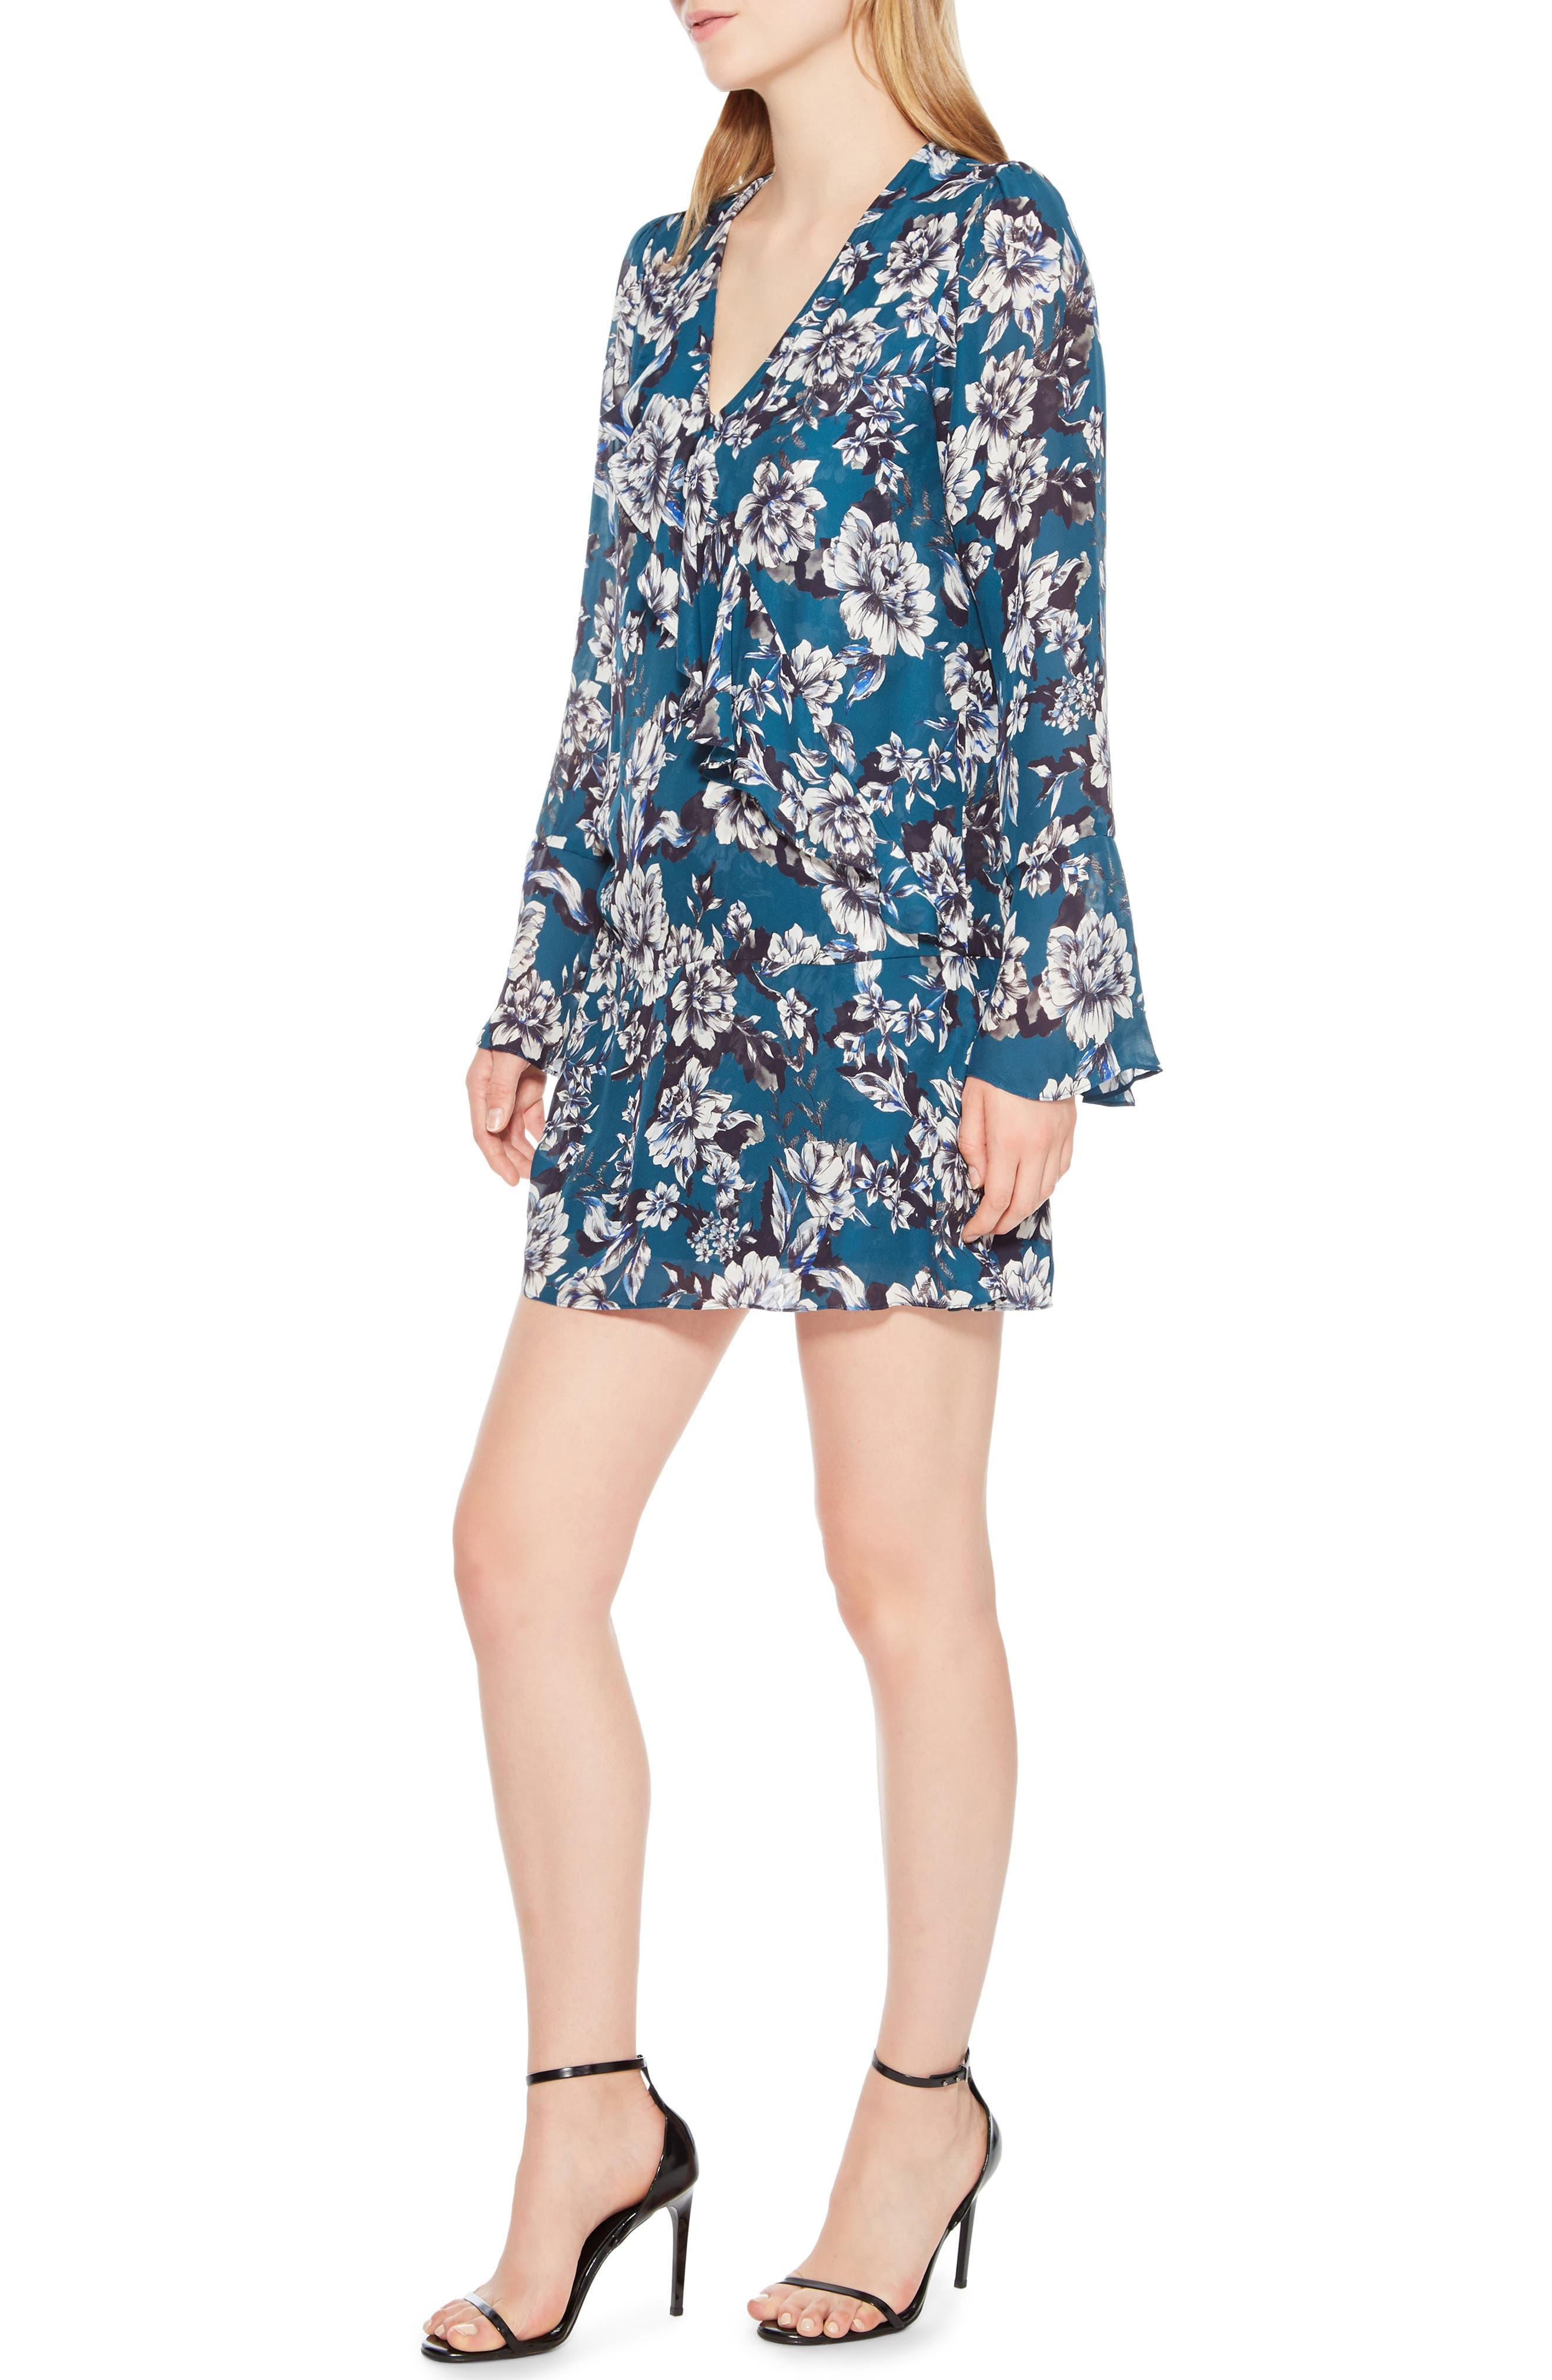 Skylar Floral Print Dress,                             Alternate thumbnail 3, color,                             EVERGLADE GARDENS